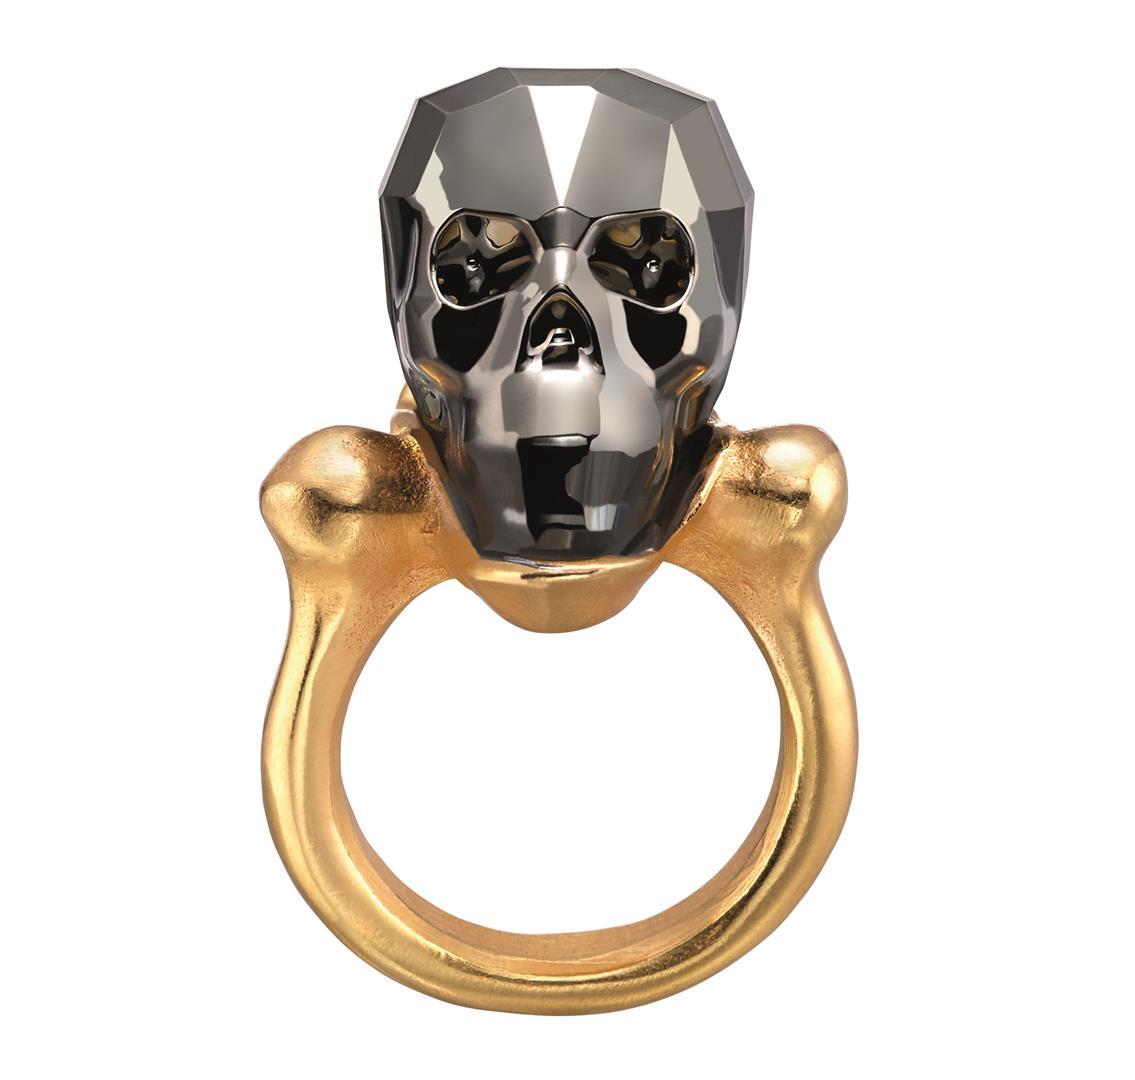 UNO de 50 טבעת גולגולת זהב 975 שח צילום יחצ חול (Large)